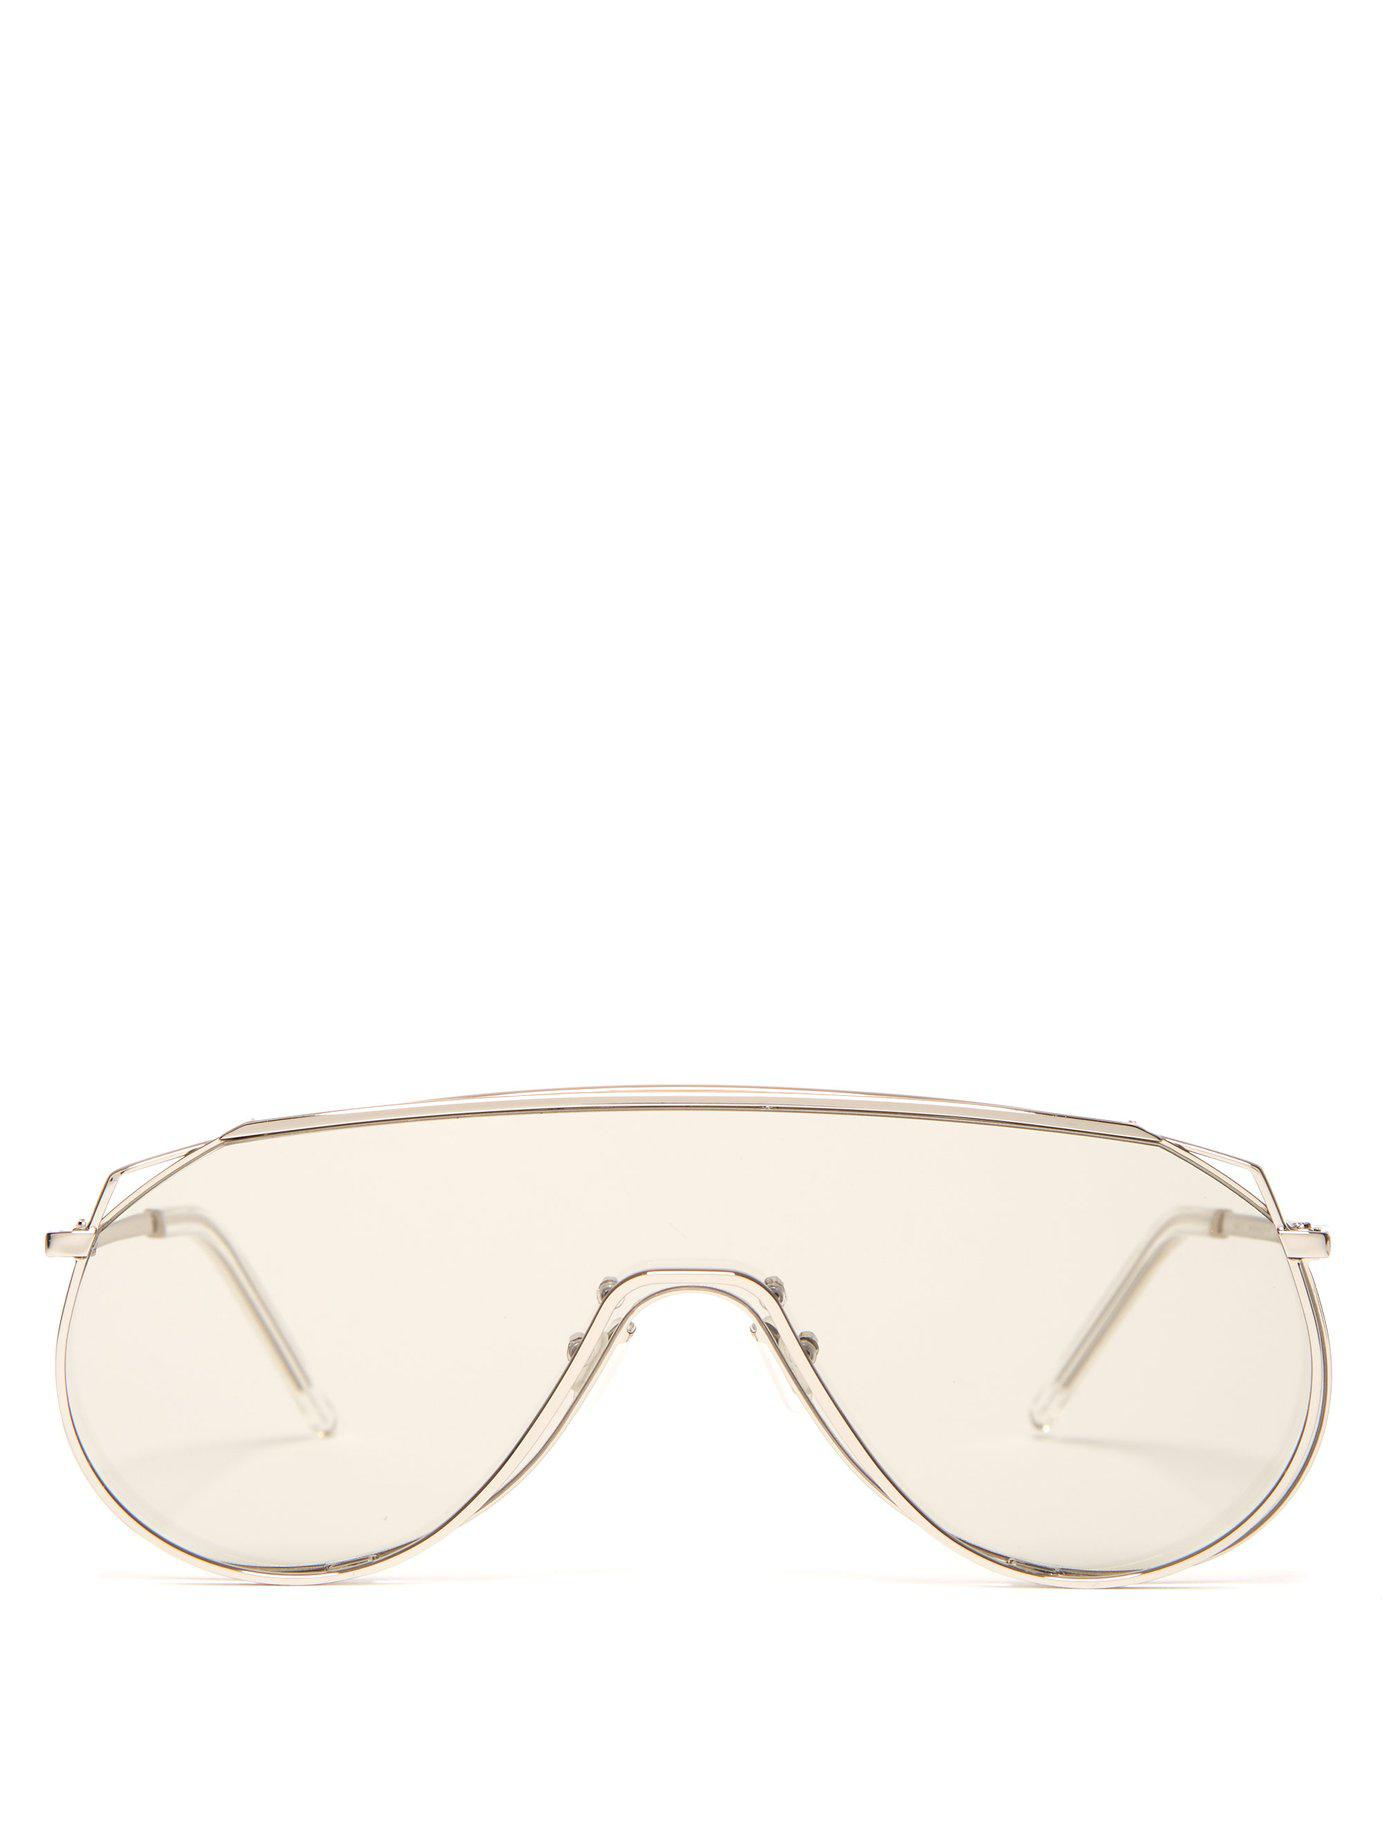 086d3ab4159d Lyst - Gentle Monster Afix 02 (k) Sunglasses in Metallic for Men